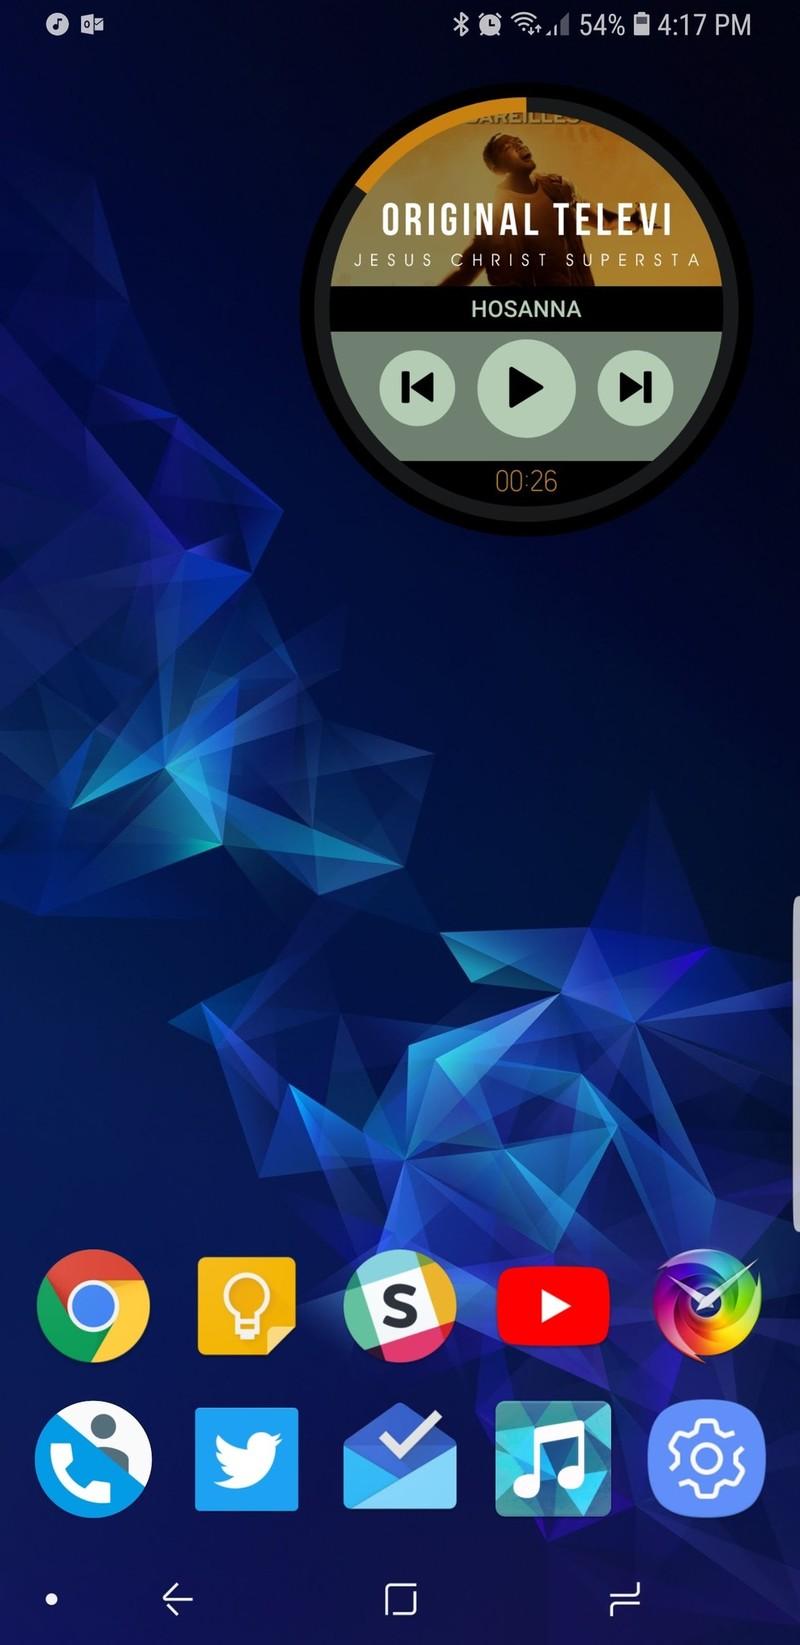 samsung-s9-screen-zoom-1.jpg?itok=-CPCoU